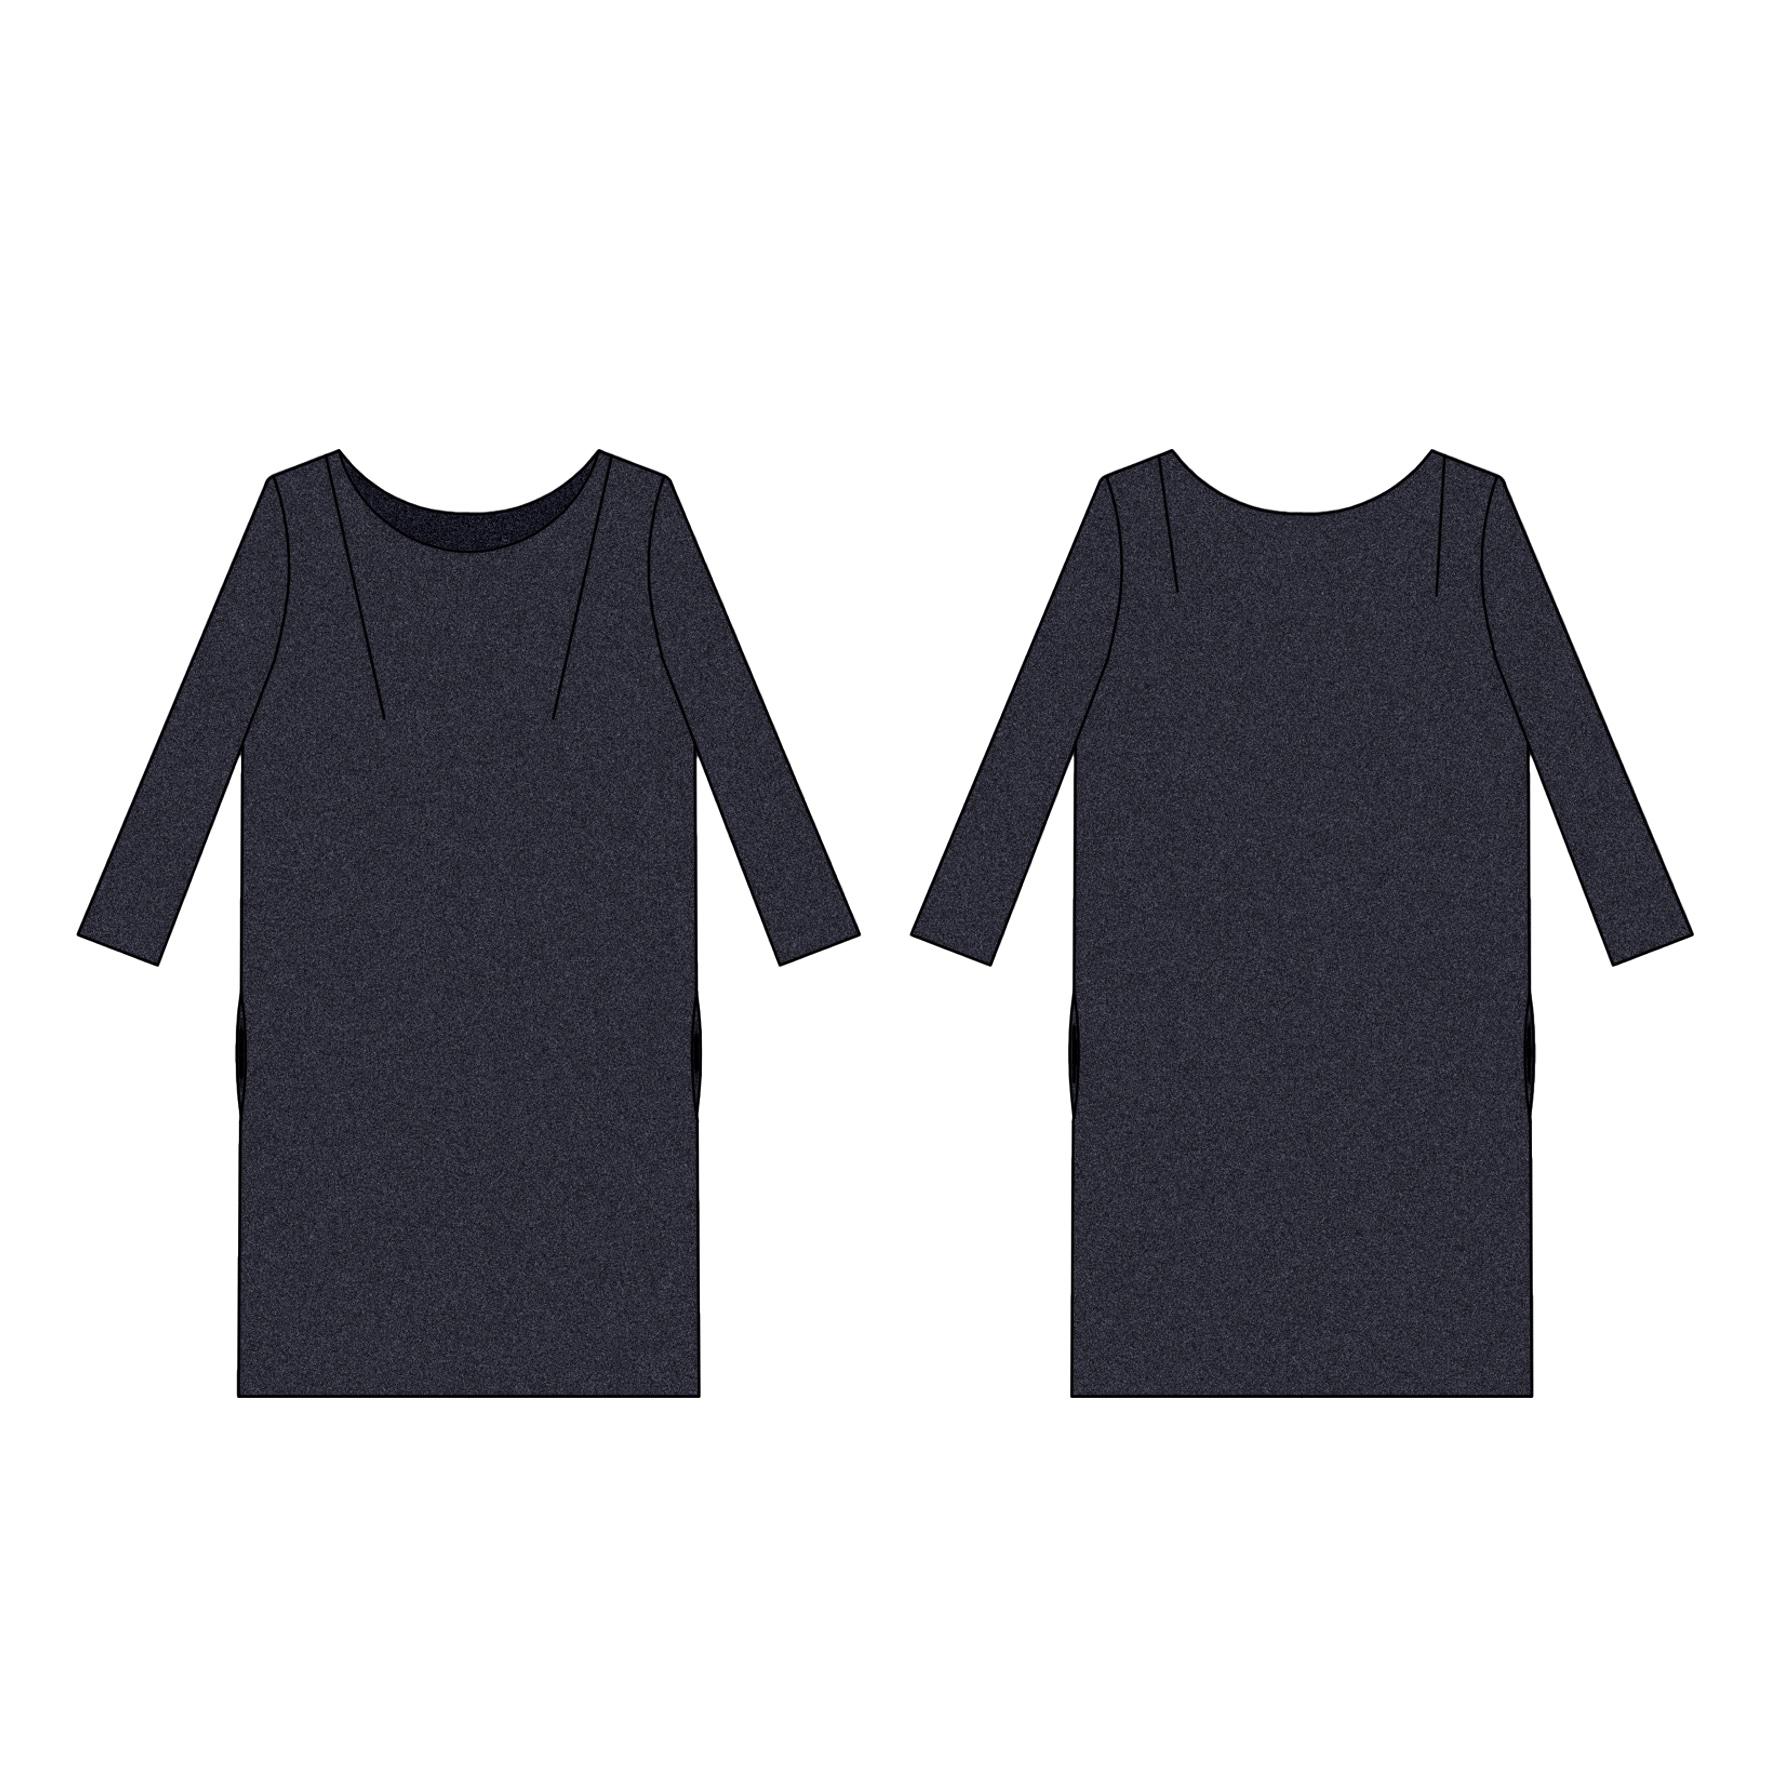 Jersey Site Robe Femme De Mode – Fyb67yvg Patron Populaire UGVpqMSz